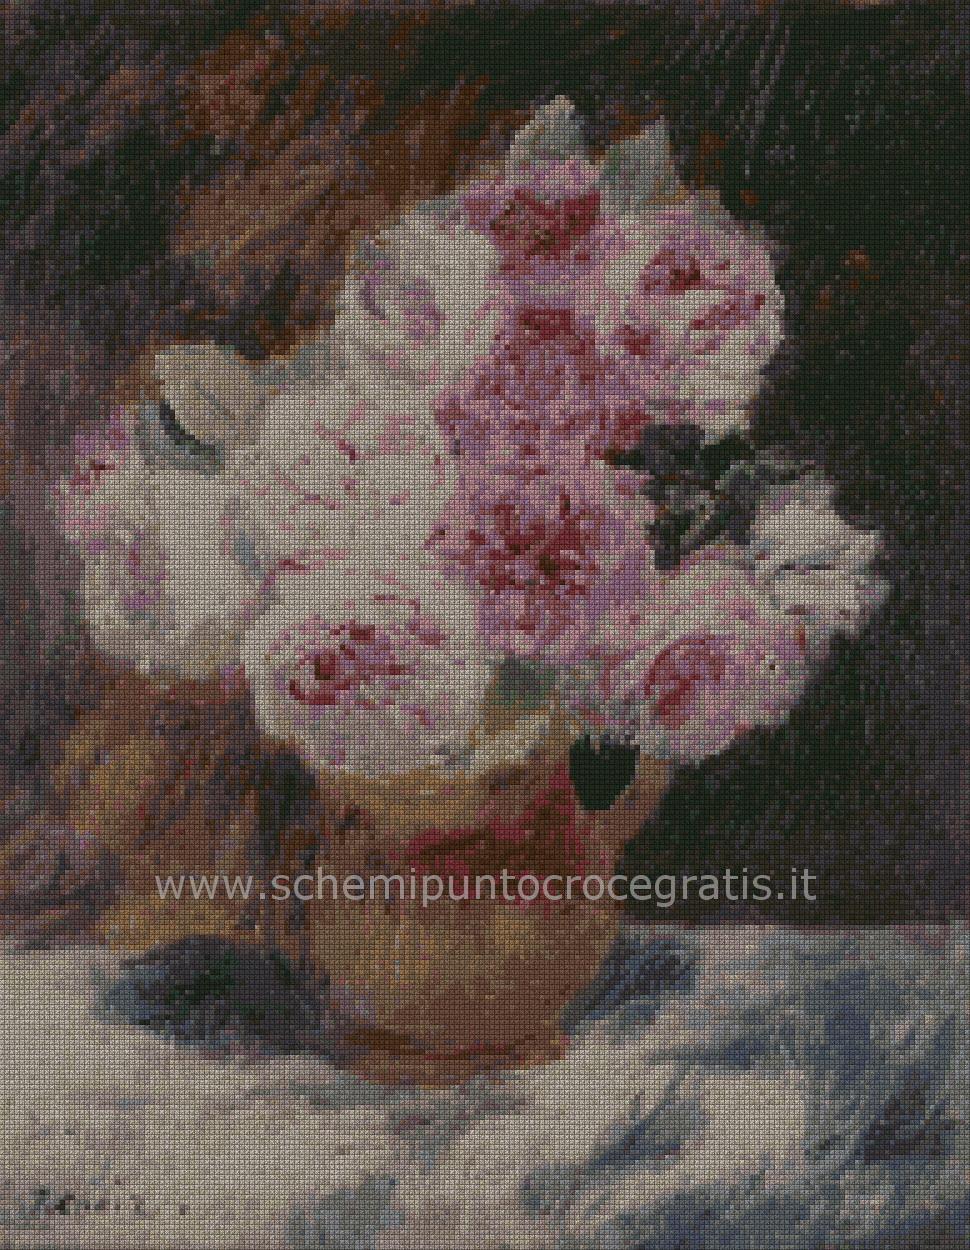 pittori_moderni/renoir/Renoir02.jpg